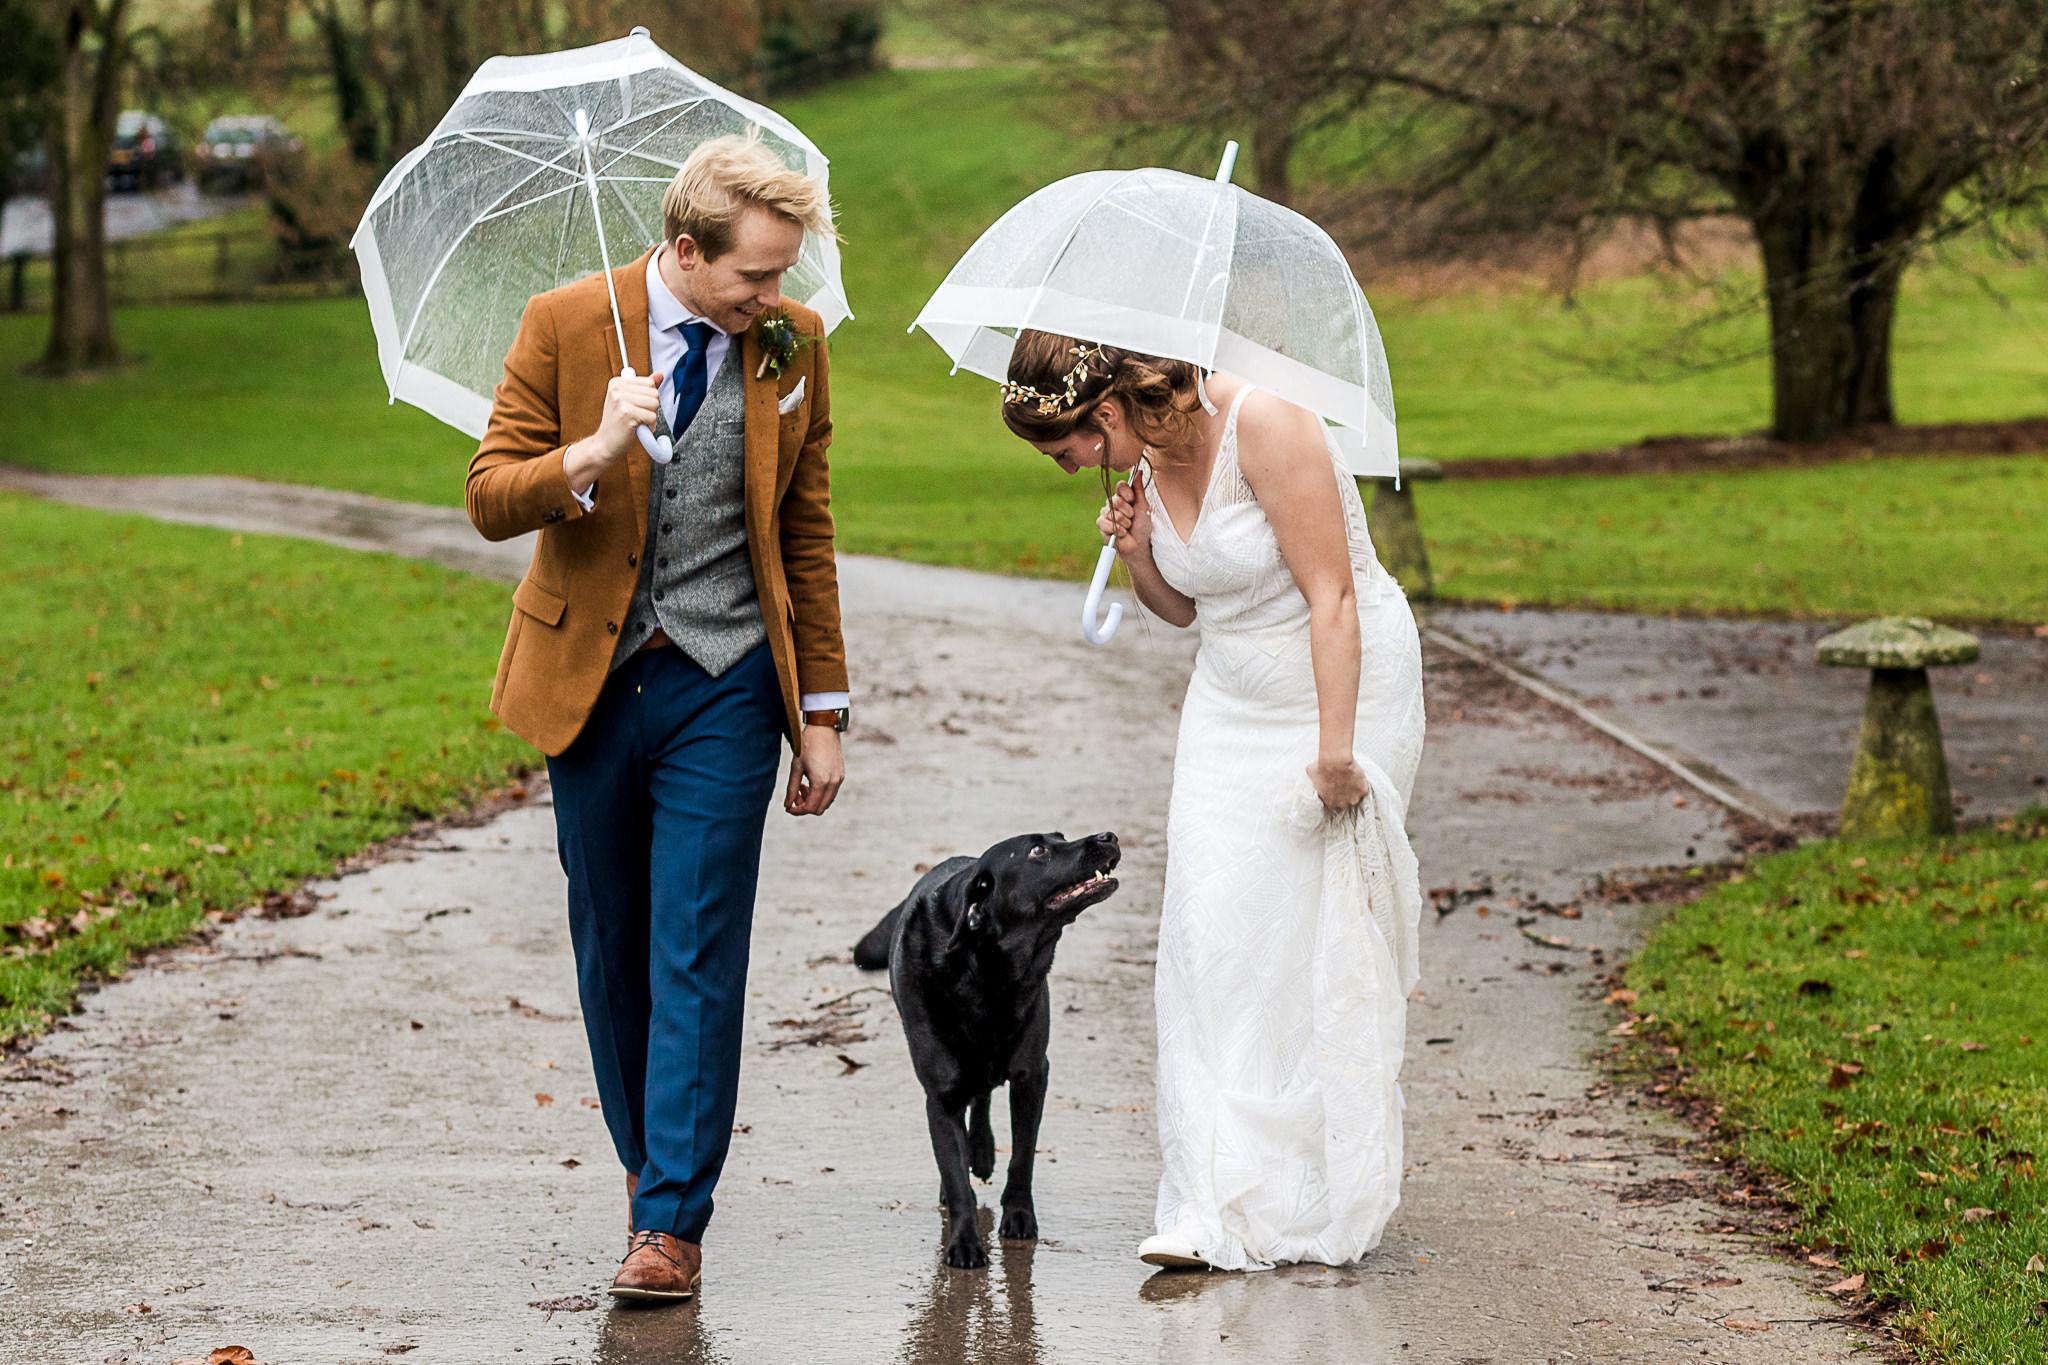 The Gathering Barn Wedding - Art by Design Photography - Wedding Photographer wiltshire